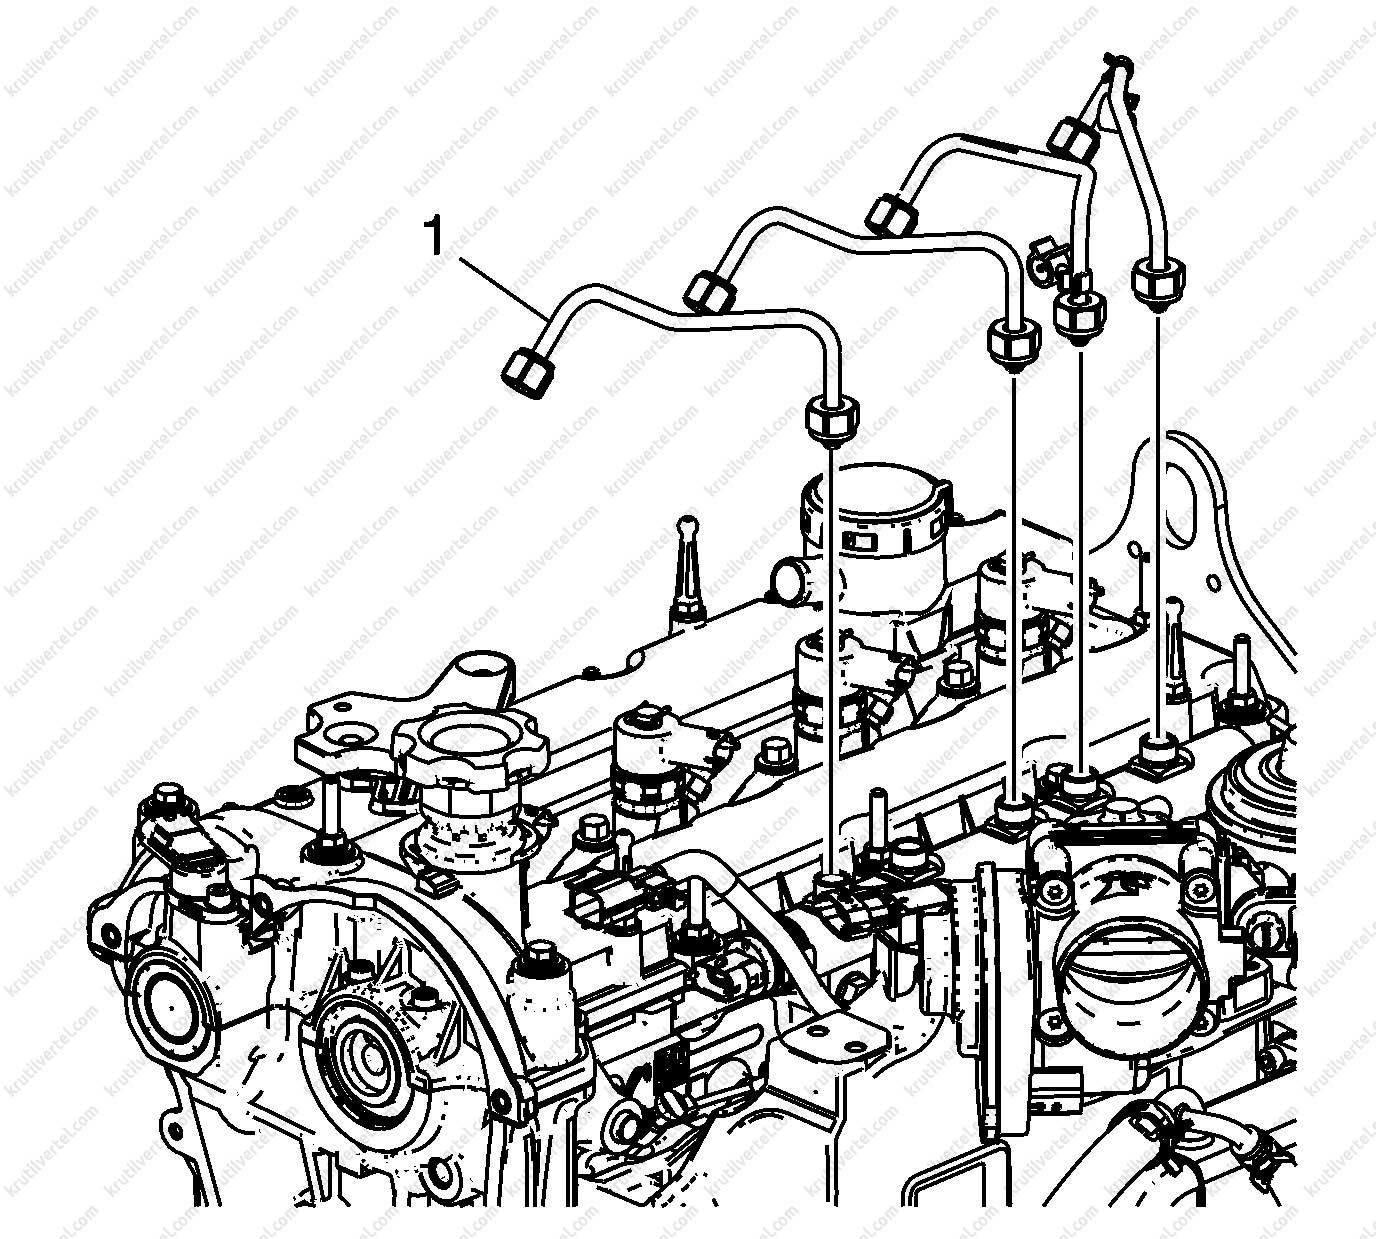 Chevrolet Trailblazer 2012, головка блока цилиндров ...